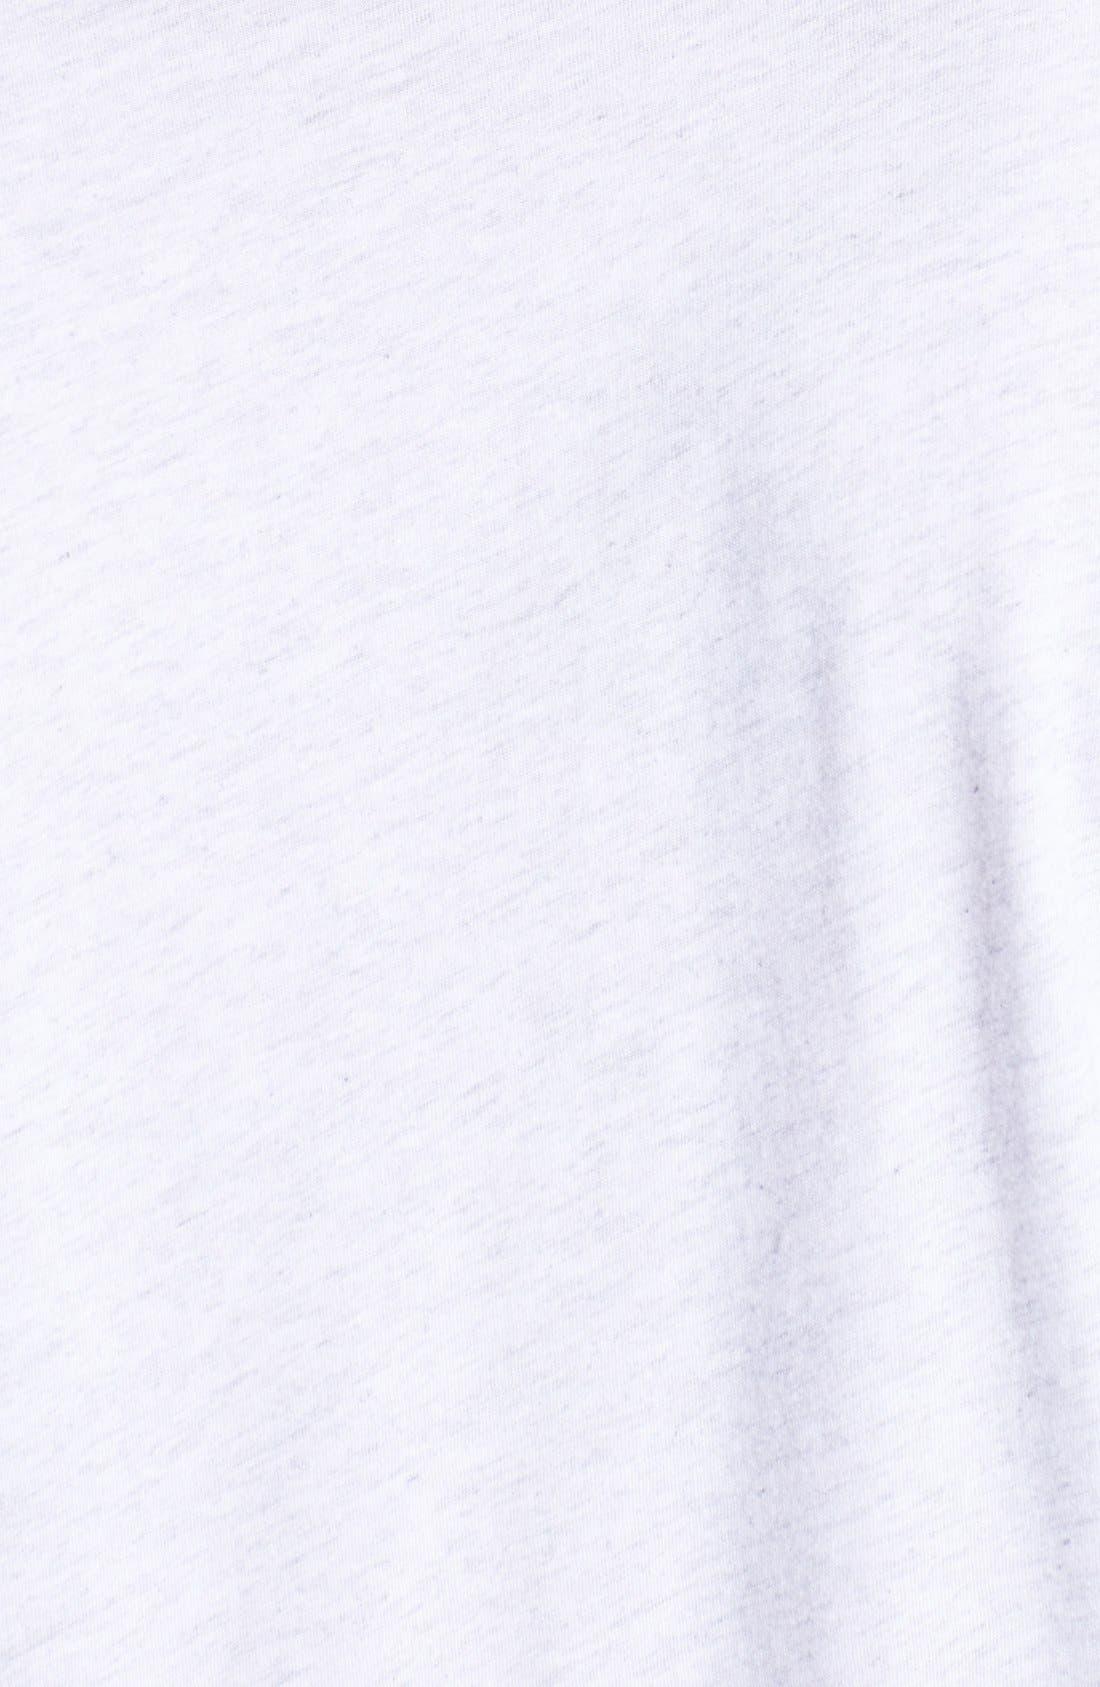 Alternate Image 3  - Bowery Supply 'South Beach' Graphic T-Shirt